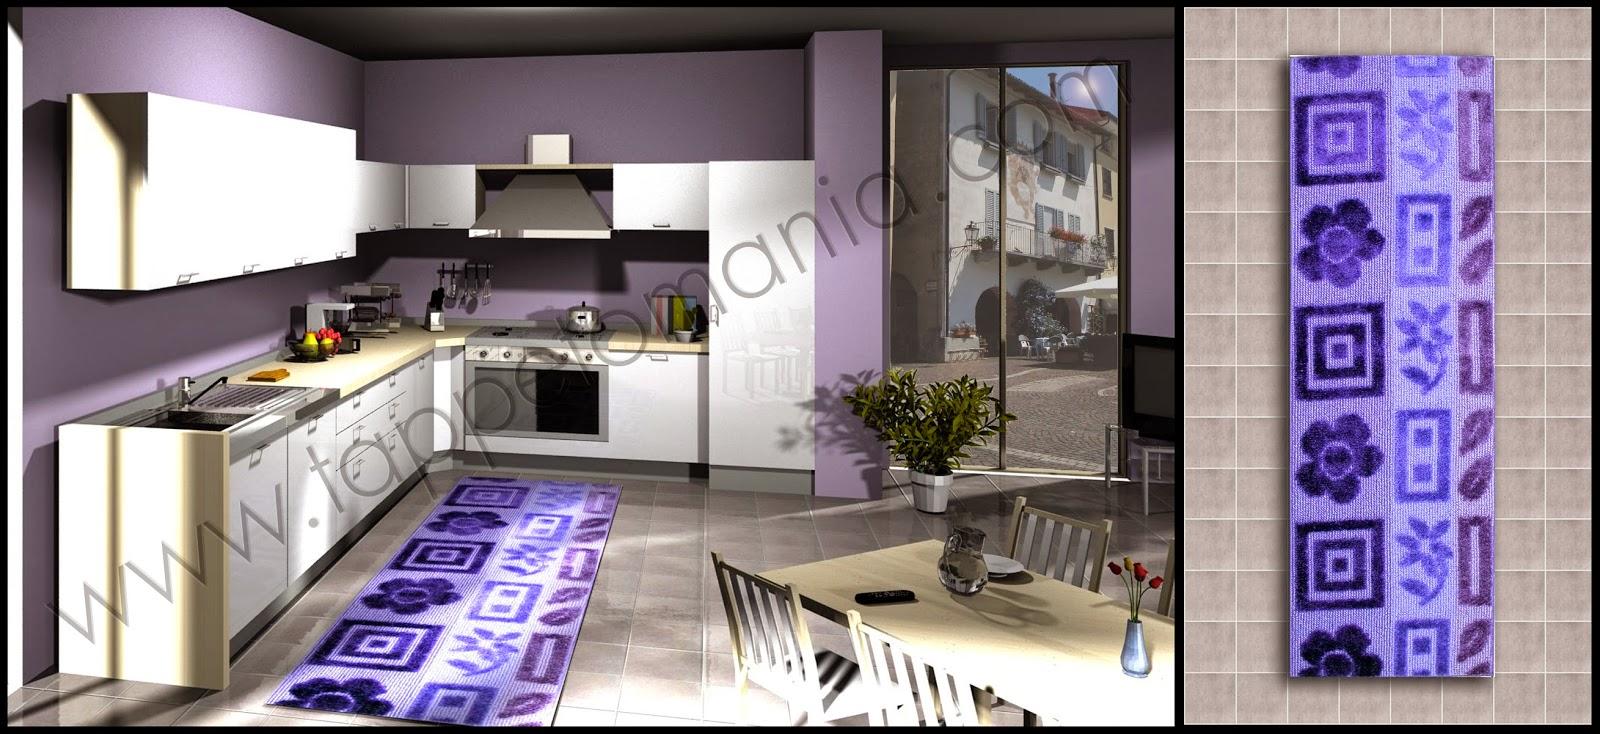 tappeti cucina colore arancione | Tappeti,tappeti cucina,stuoie ...